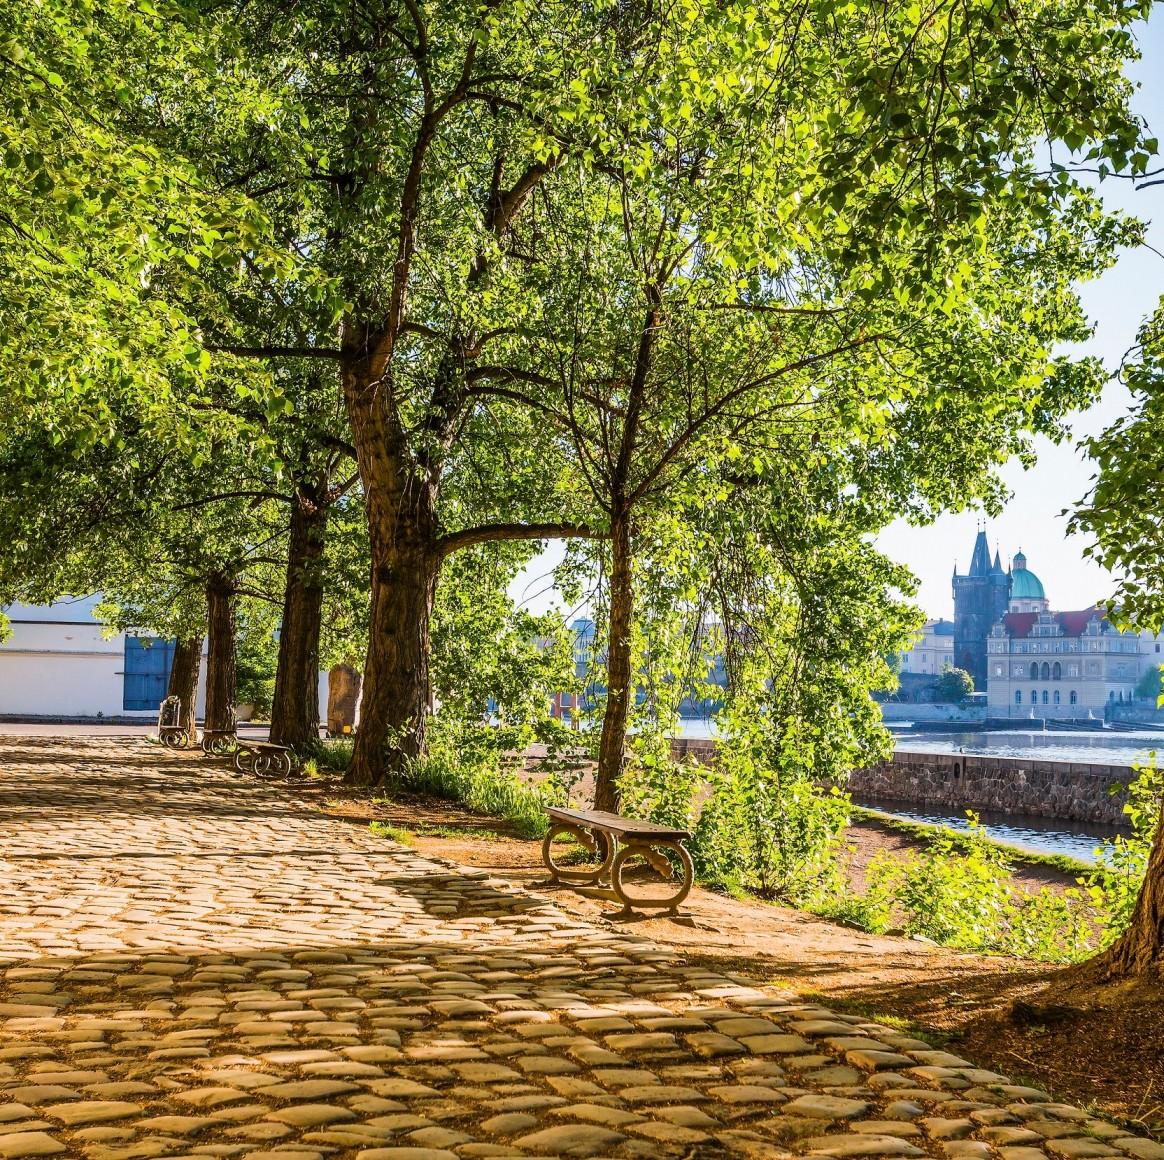 Image Of Kampa Park, Historic Hotels Worldwide